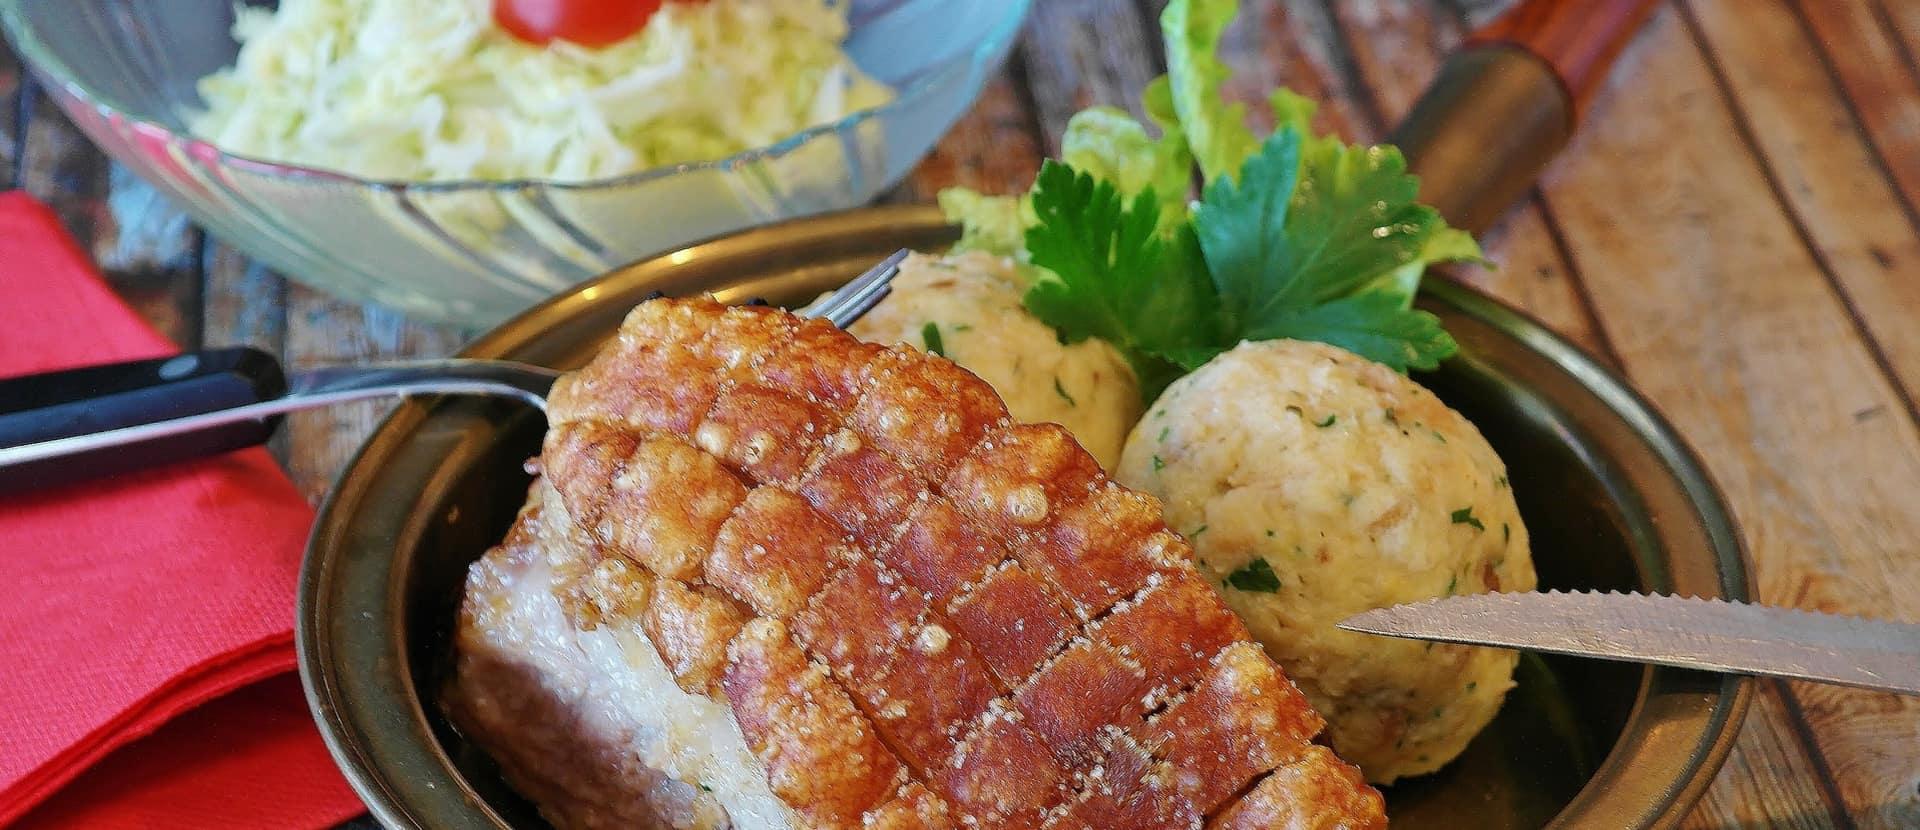 Pork Pot Roast with Crackling